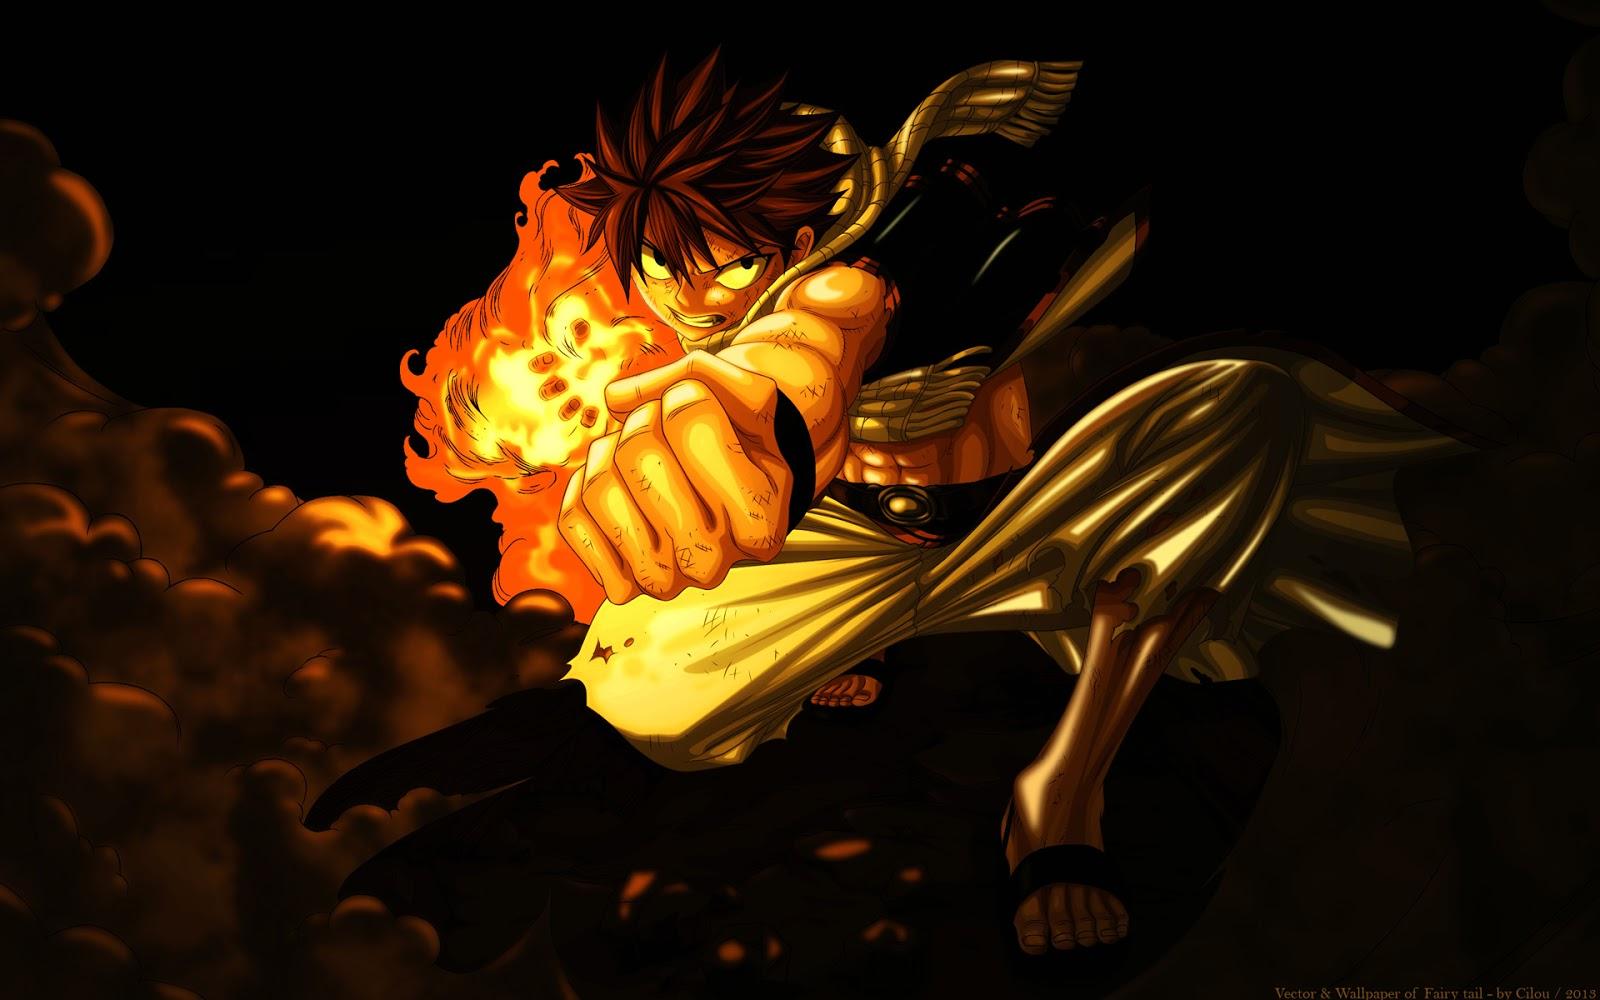 Fairy Tail Natsu Dragneel Anime HD Wallpaper Desktop Background 1600x1000